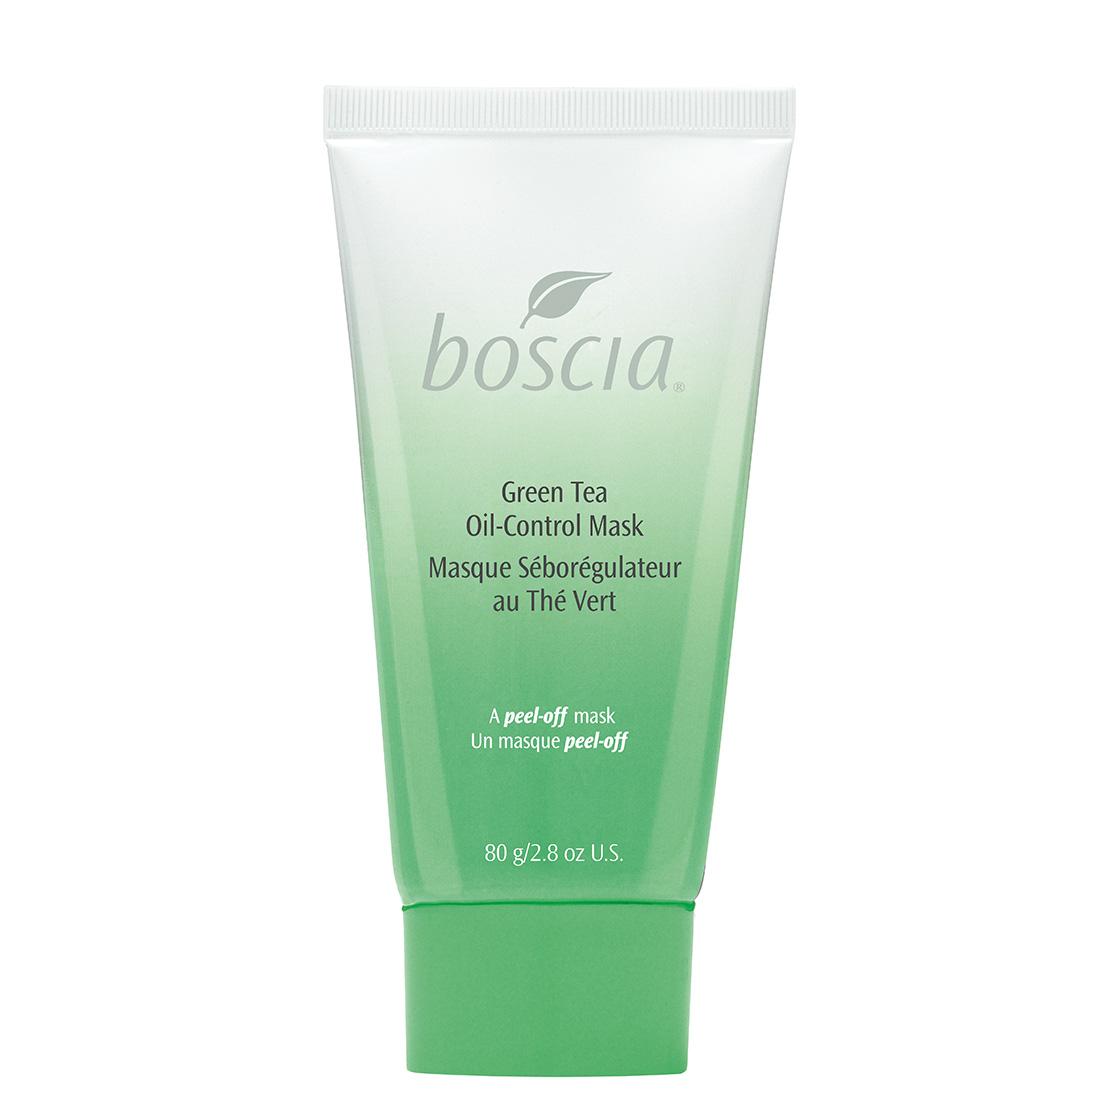 boscia Green Tea Oil-Control Mask